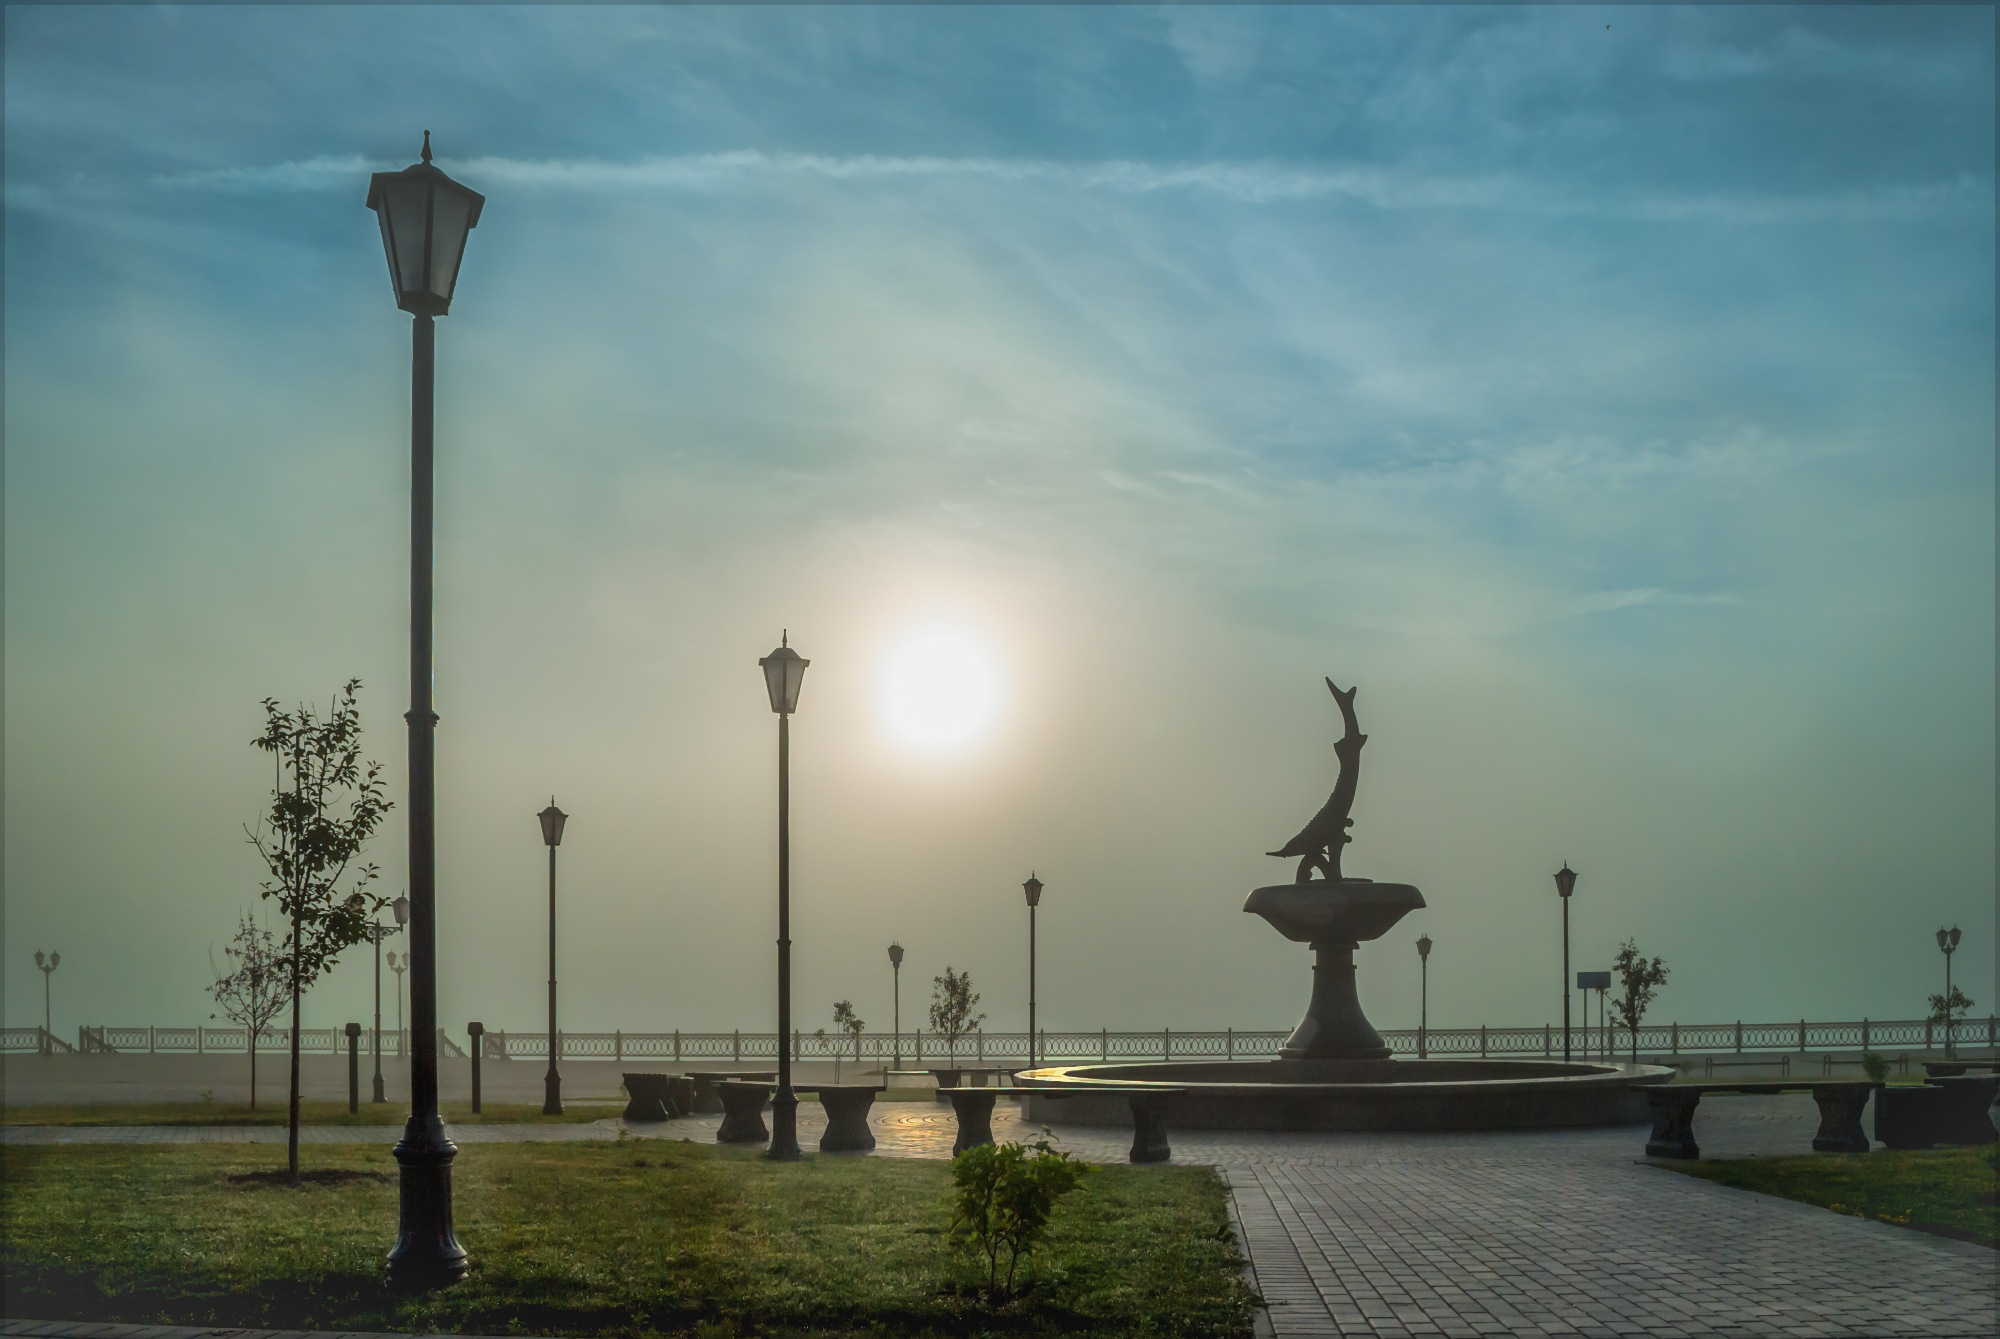 Спящий фонтан (Not awakened fountain) by tatyanabelousova0996